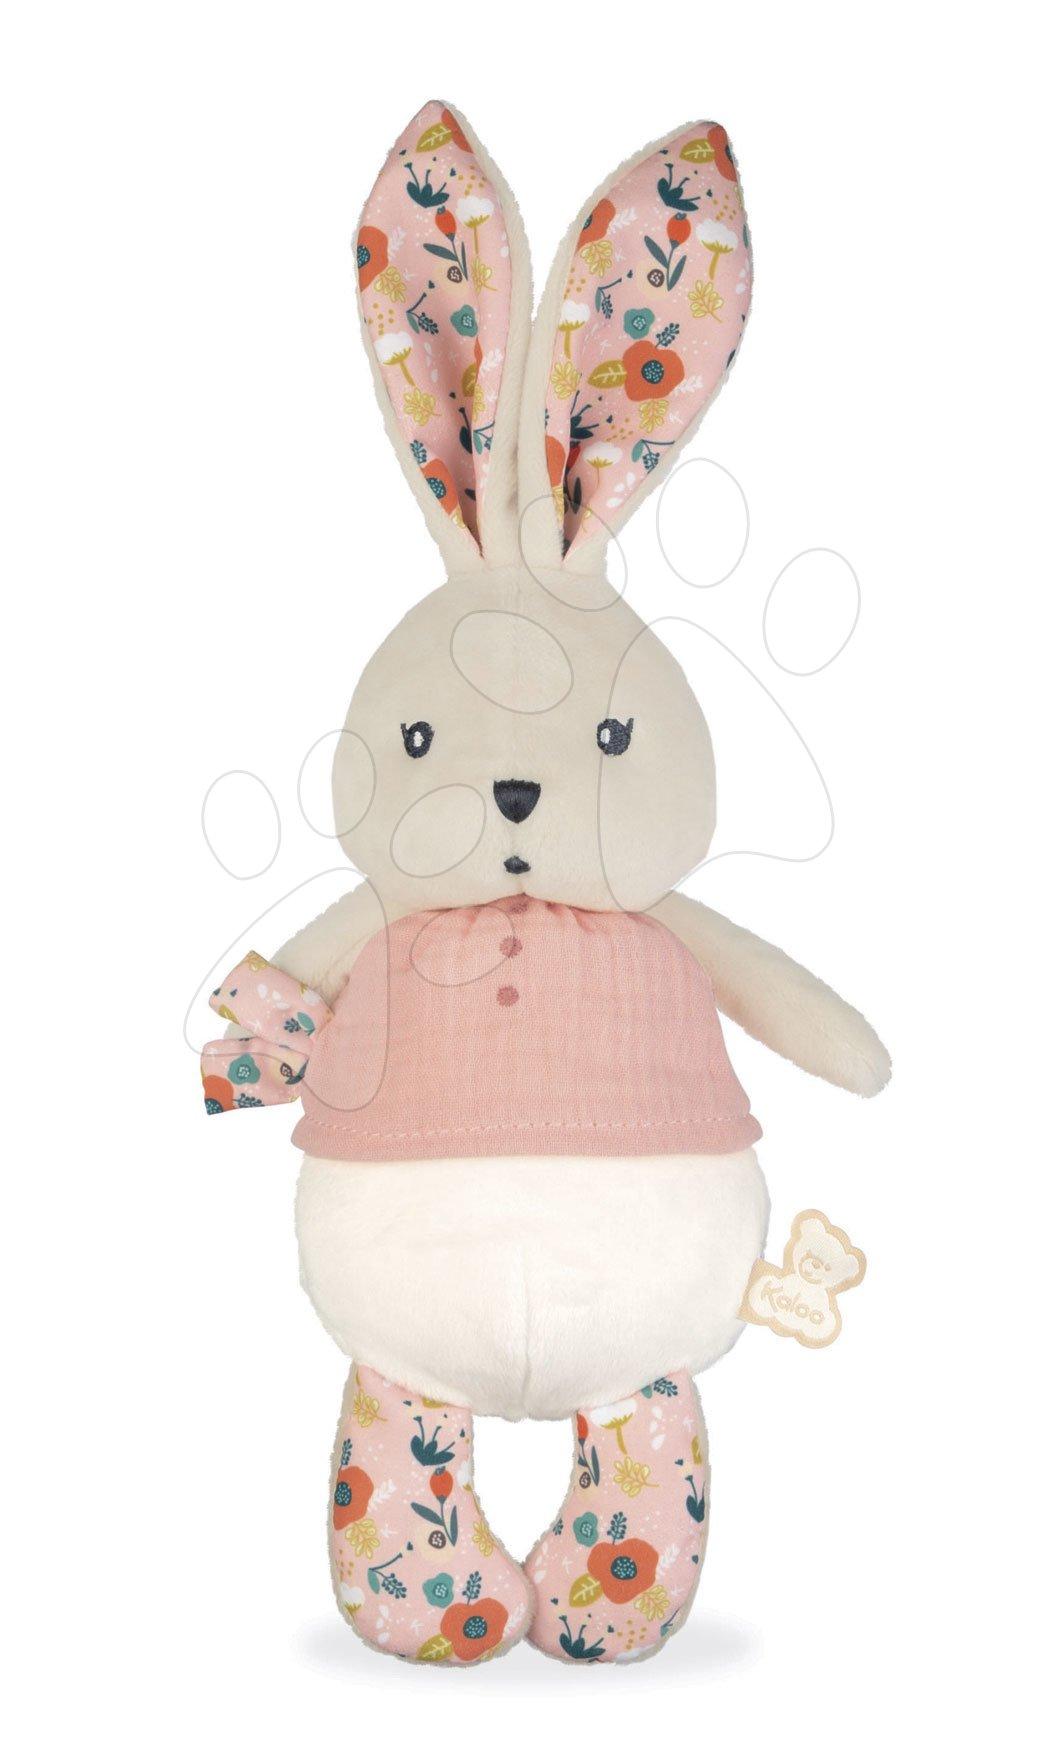 Handrová bábika zajačik Coquelicot Rabbit Doll Poppy K'doux Kaloo ružový 25 cm z jemného materiálu od 0 mes